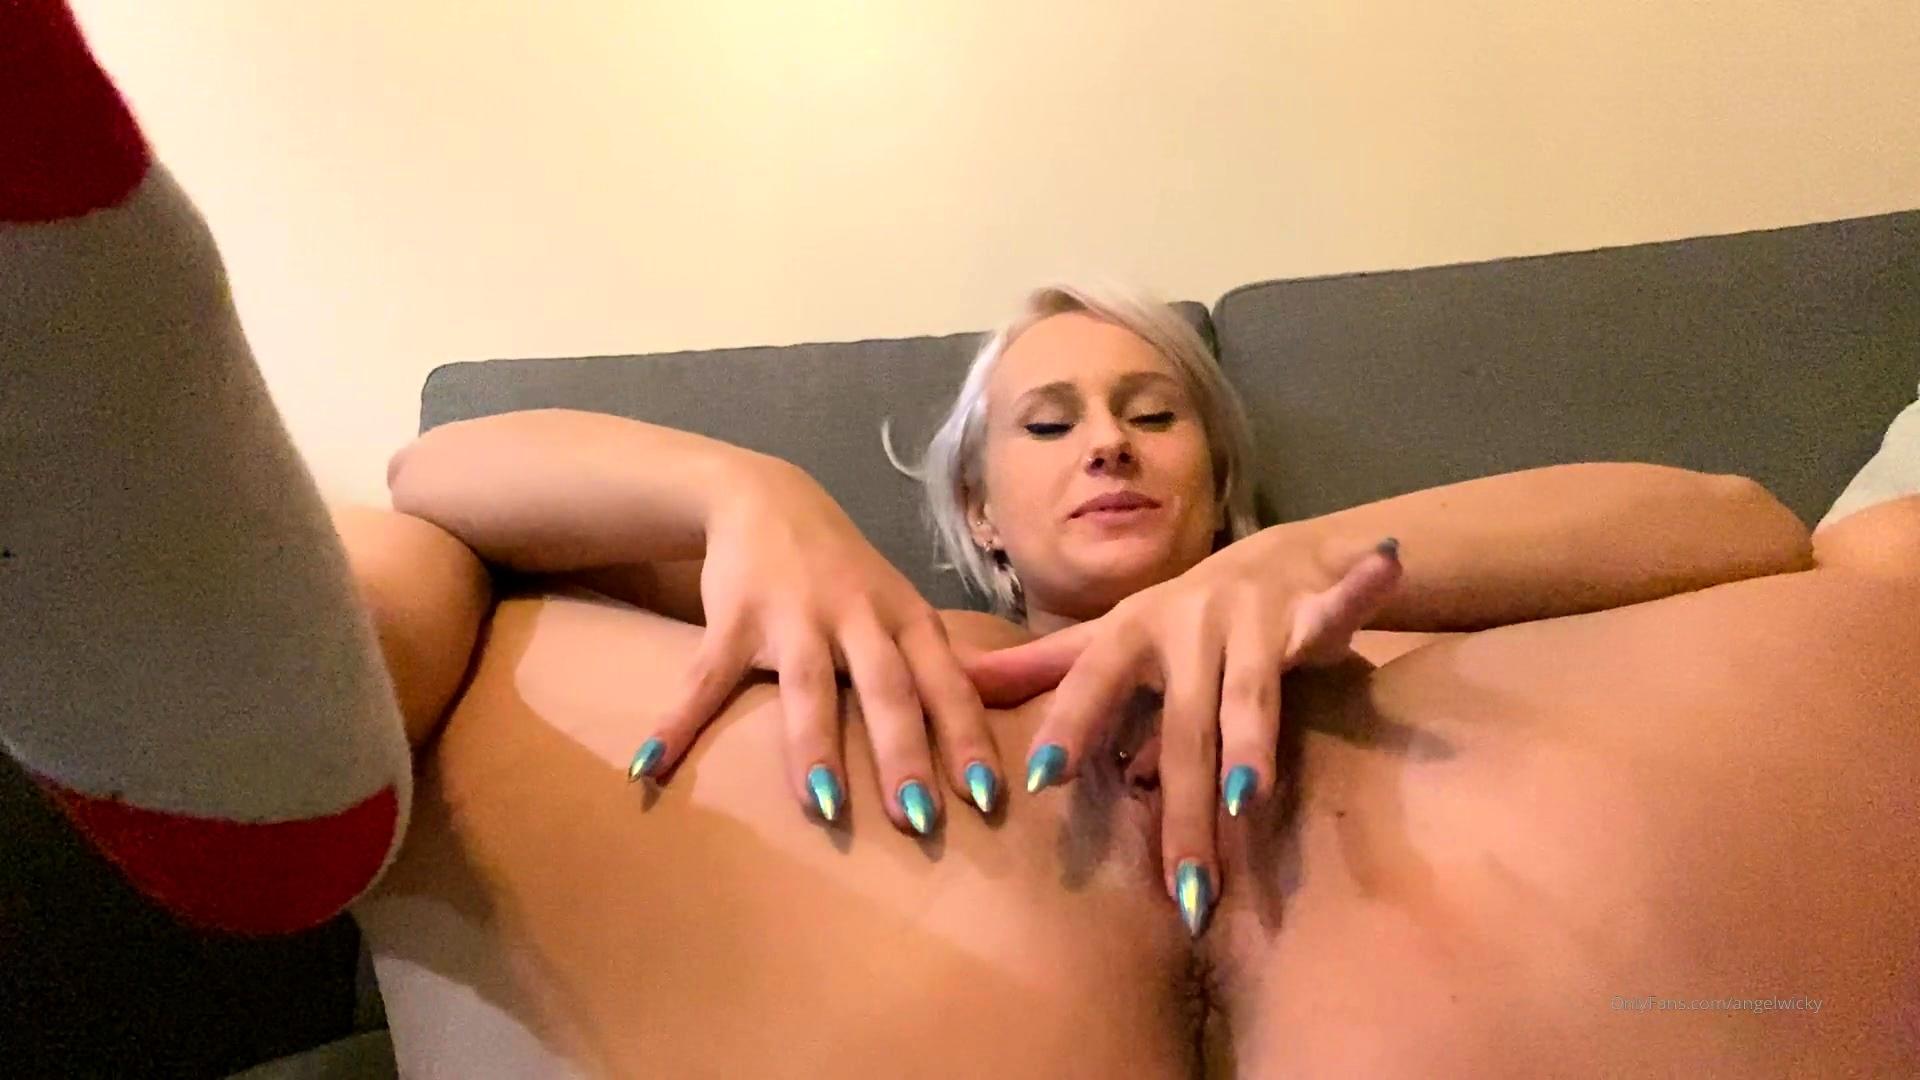 Girl Helps Friend Masturbate